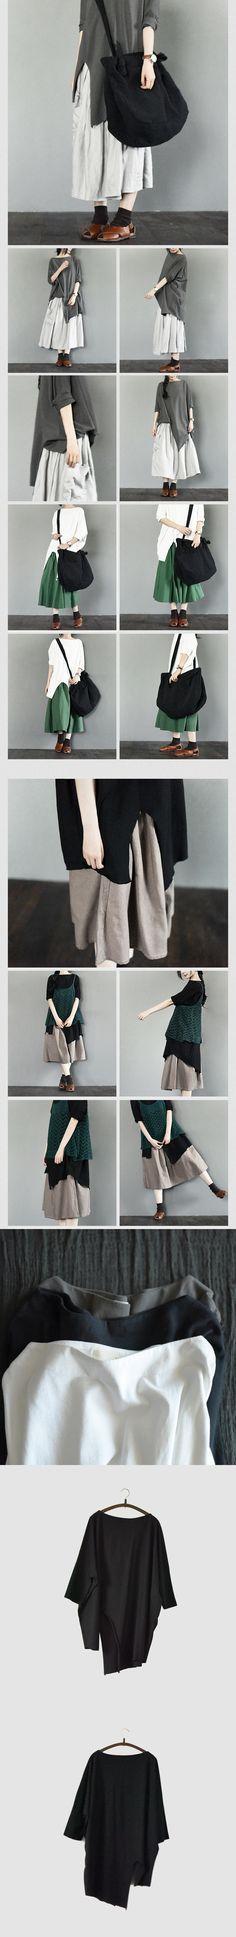 kjjk Edge White/Black Simple Bat Sleeve T-shirt Causel Matching Blouse Women Clothes